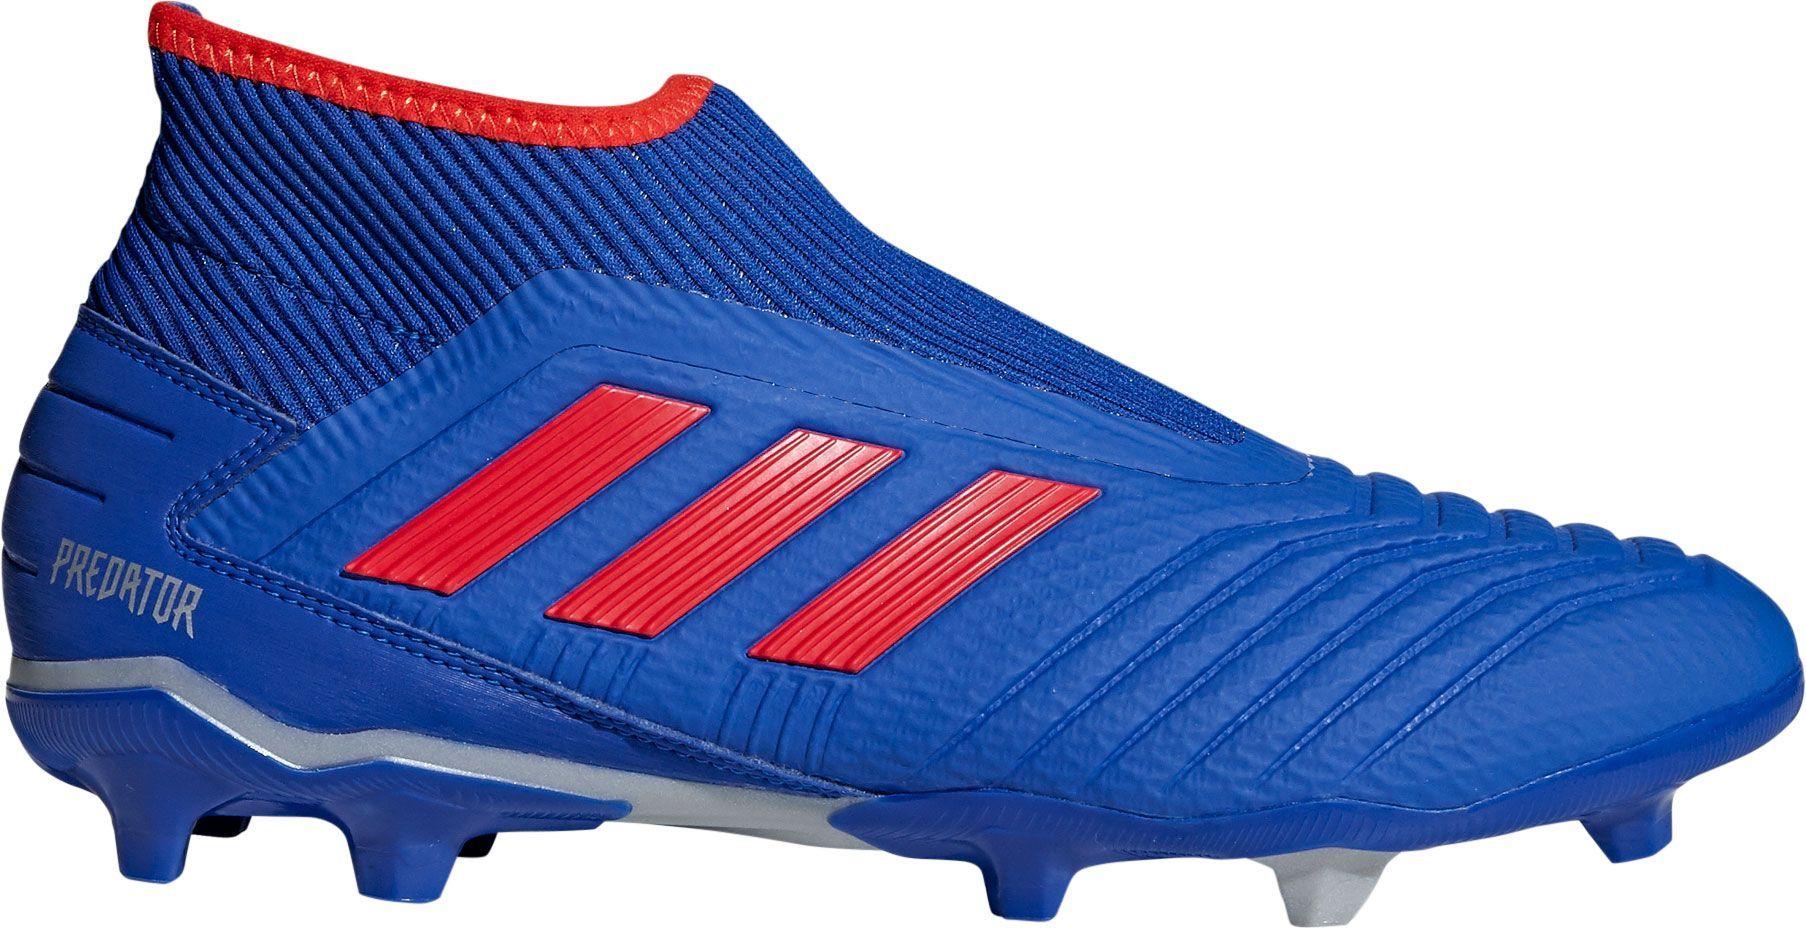 68984c778 adidas Men s Predator 19.3 Laceless FG Soccer Cleats